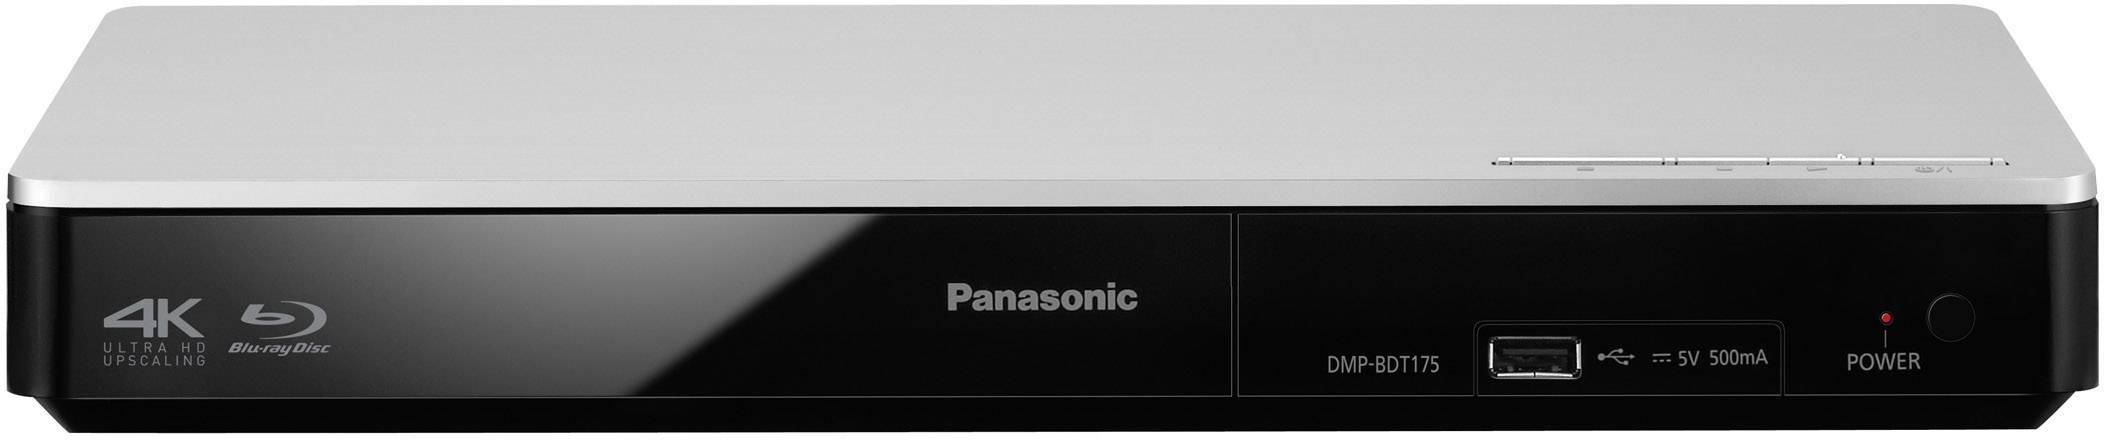 Panasonic DMP-BDT175EG Blu-ray Player Windows 8 X64